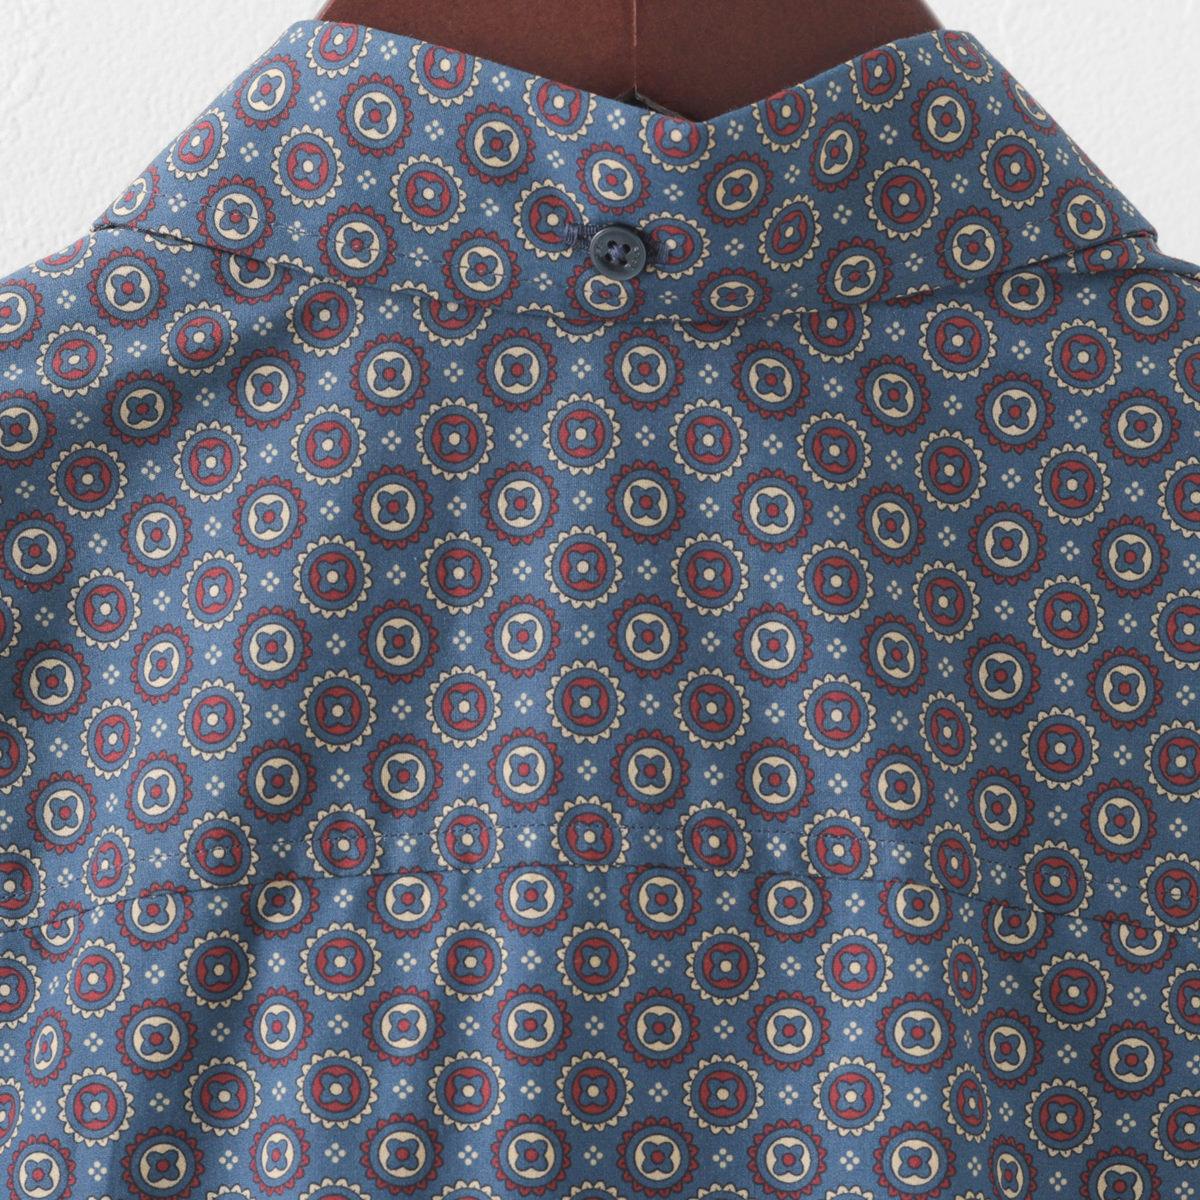 Ben Sherman ベンシャーマン メンズ 長袖シャツ ジオフラワープリント 2色 アイボリー ネイビー スリムフィット